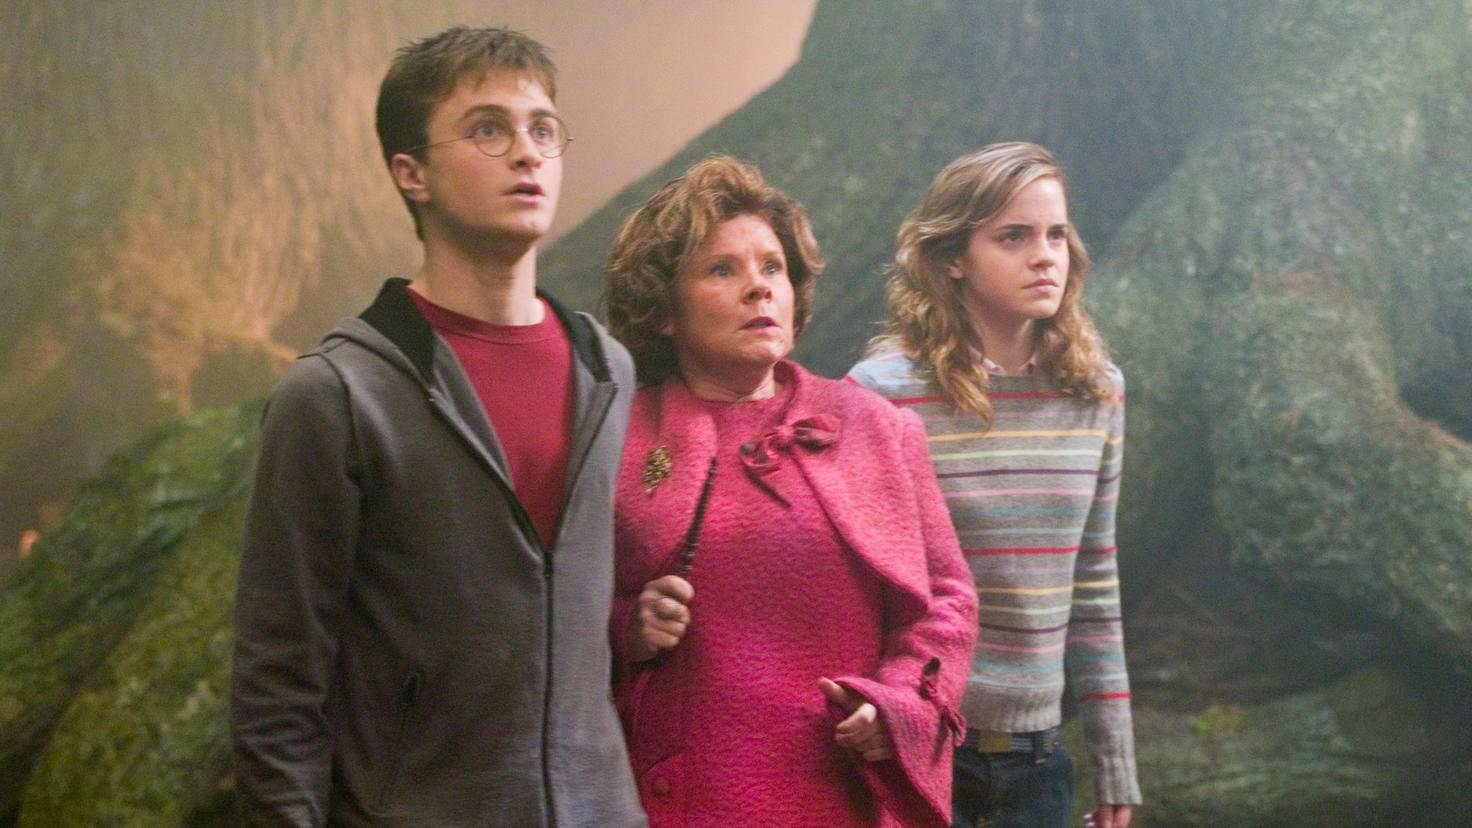 Harry Potter hermine stranger Dolores Umbridge